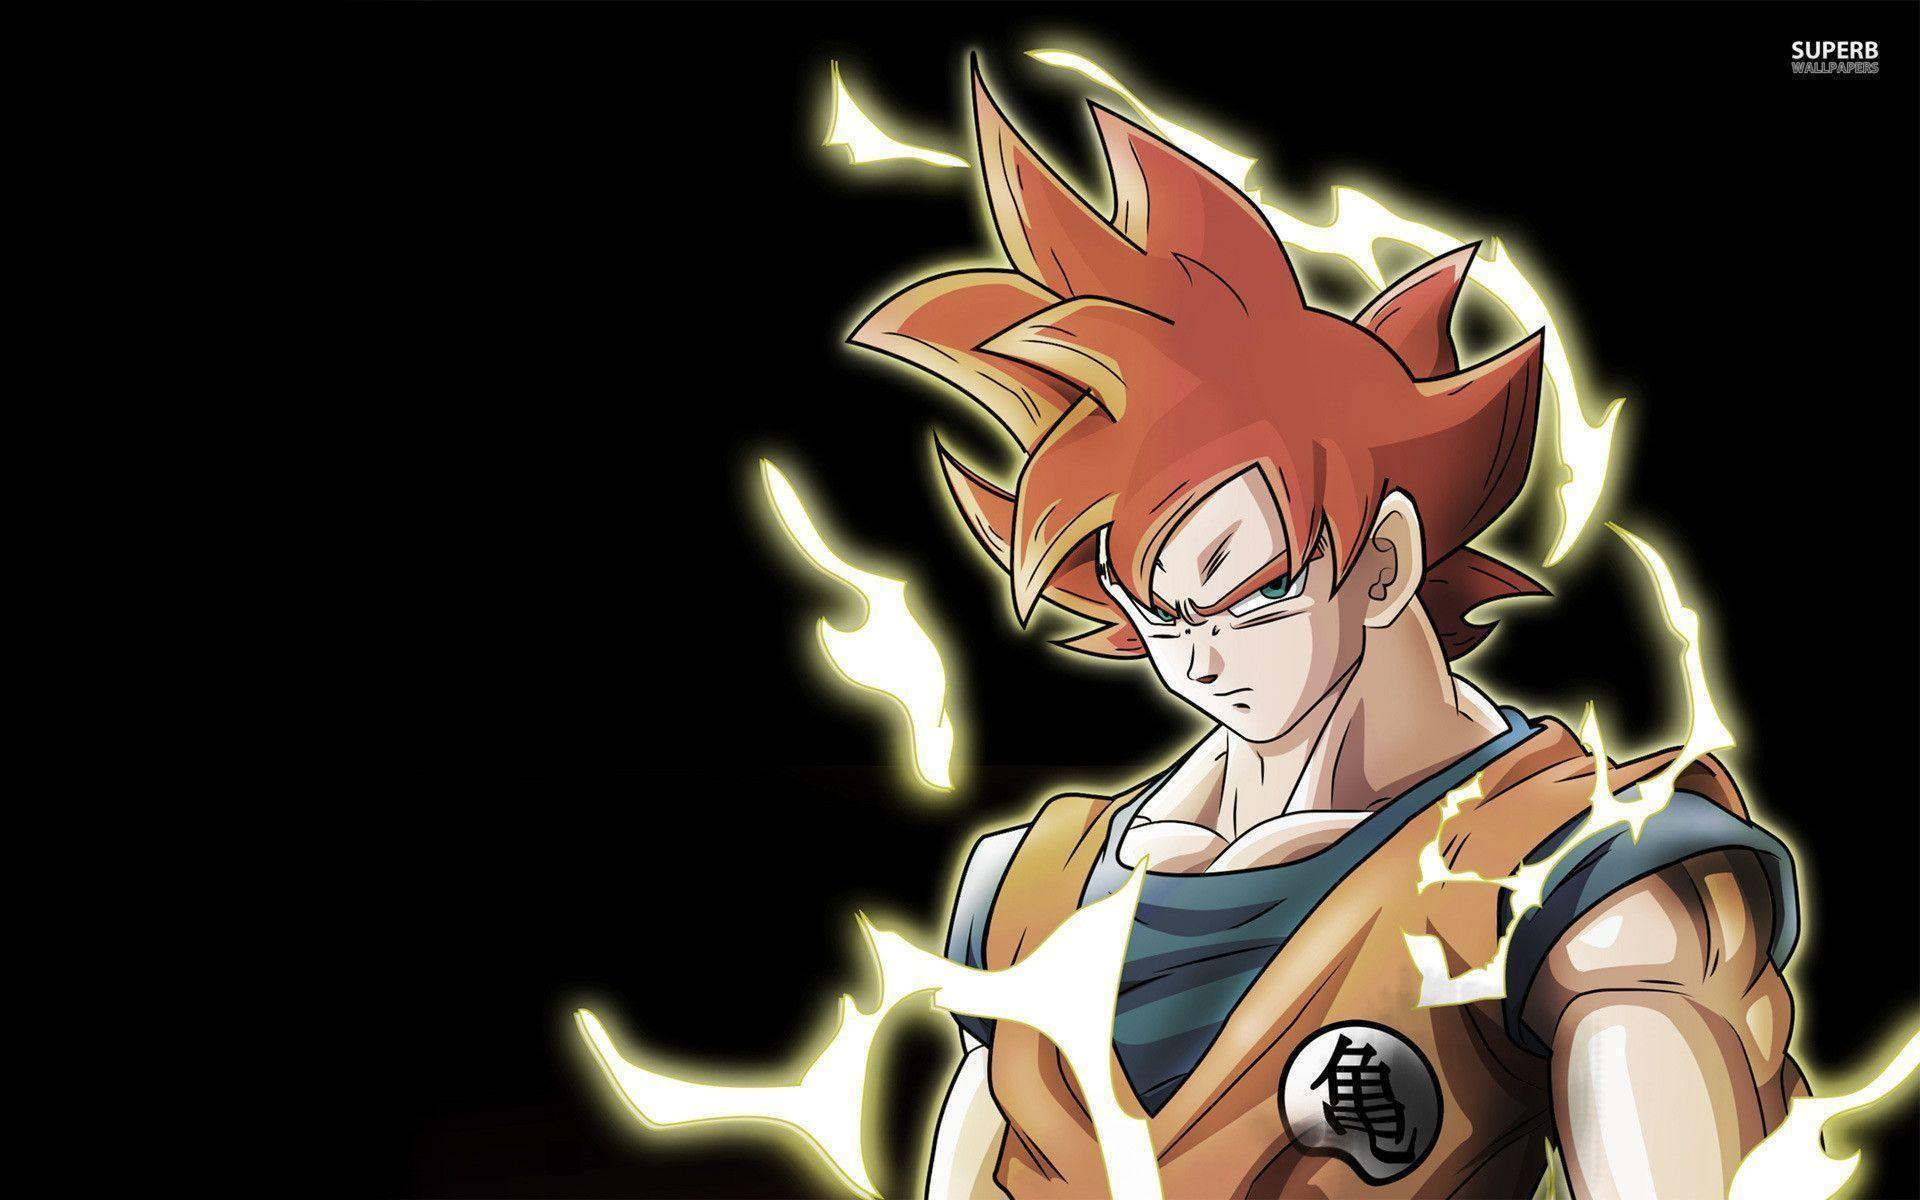 Goku Wallpapers – Full HD wallpaper search